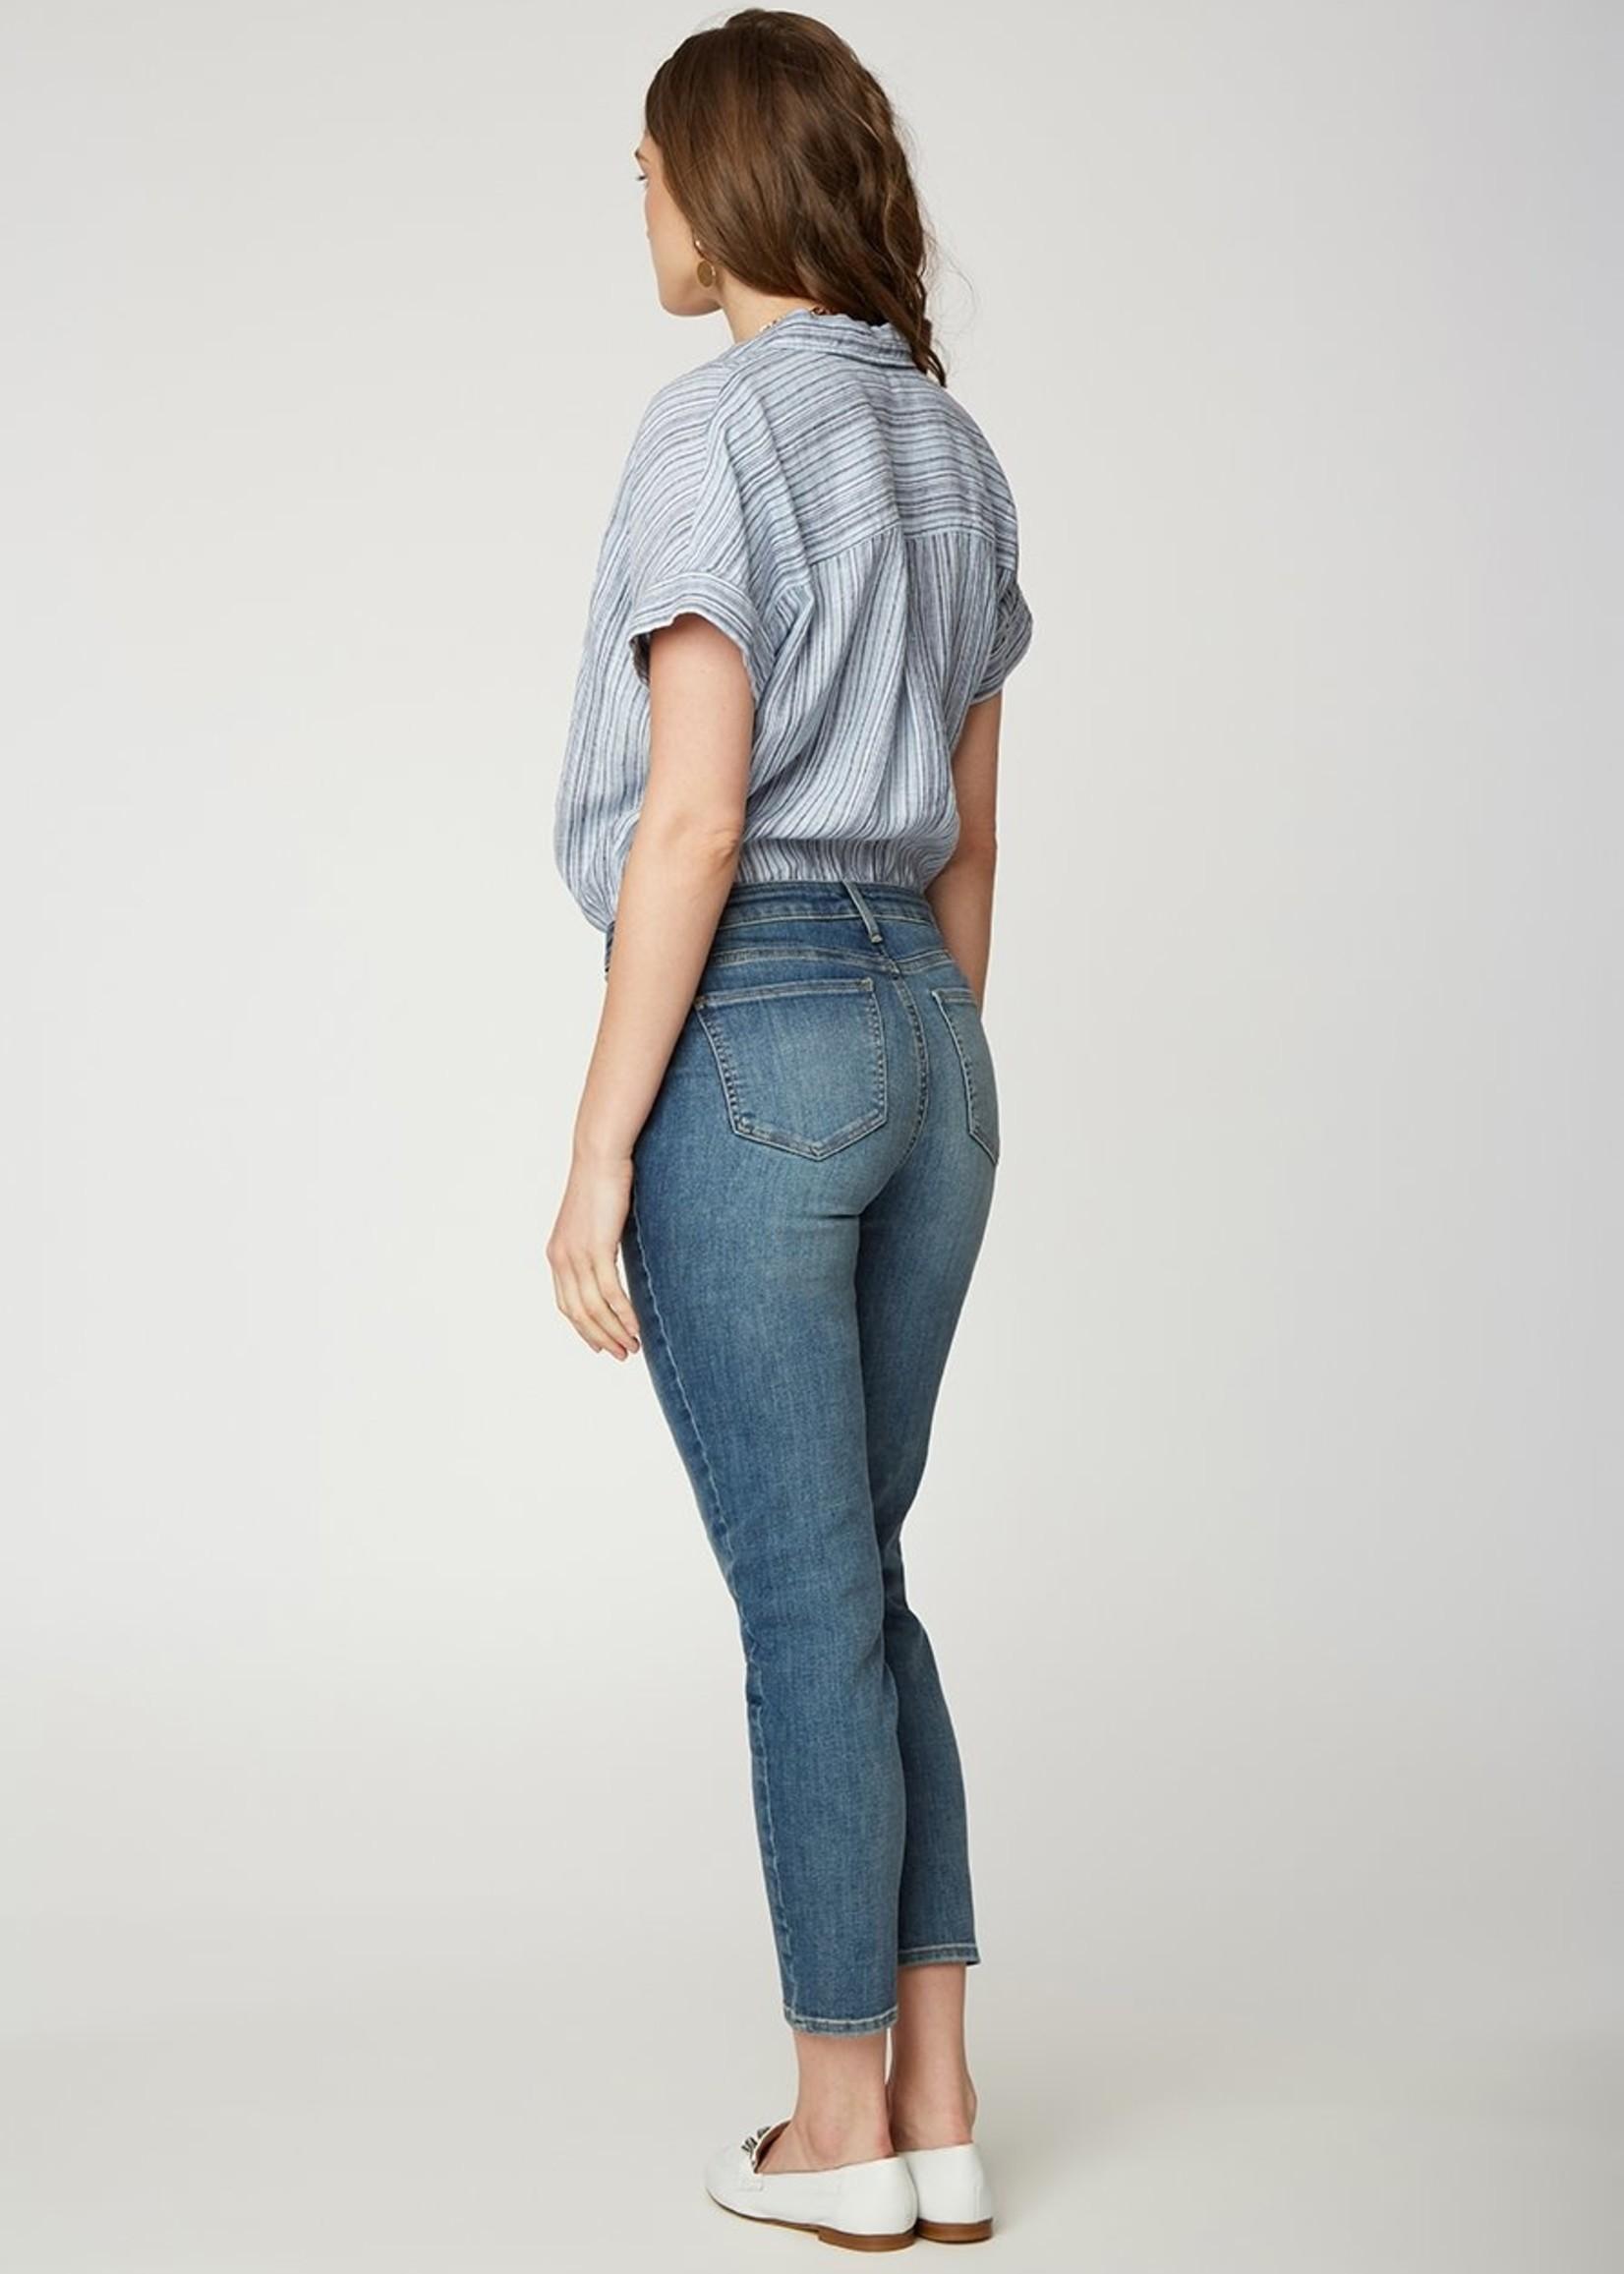 NYDJ Easy Fit Skinny Jeans - Clayburn